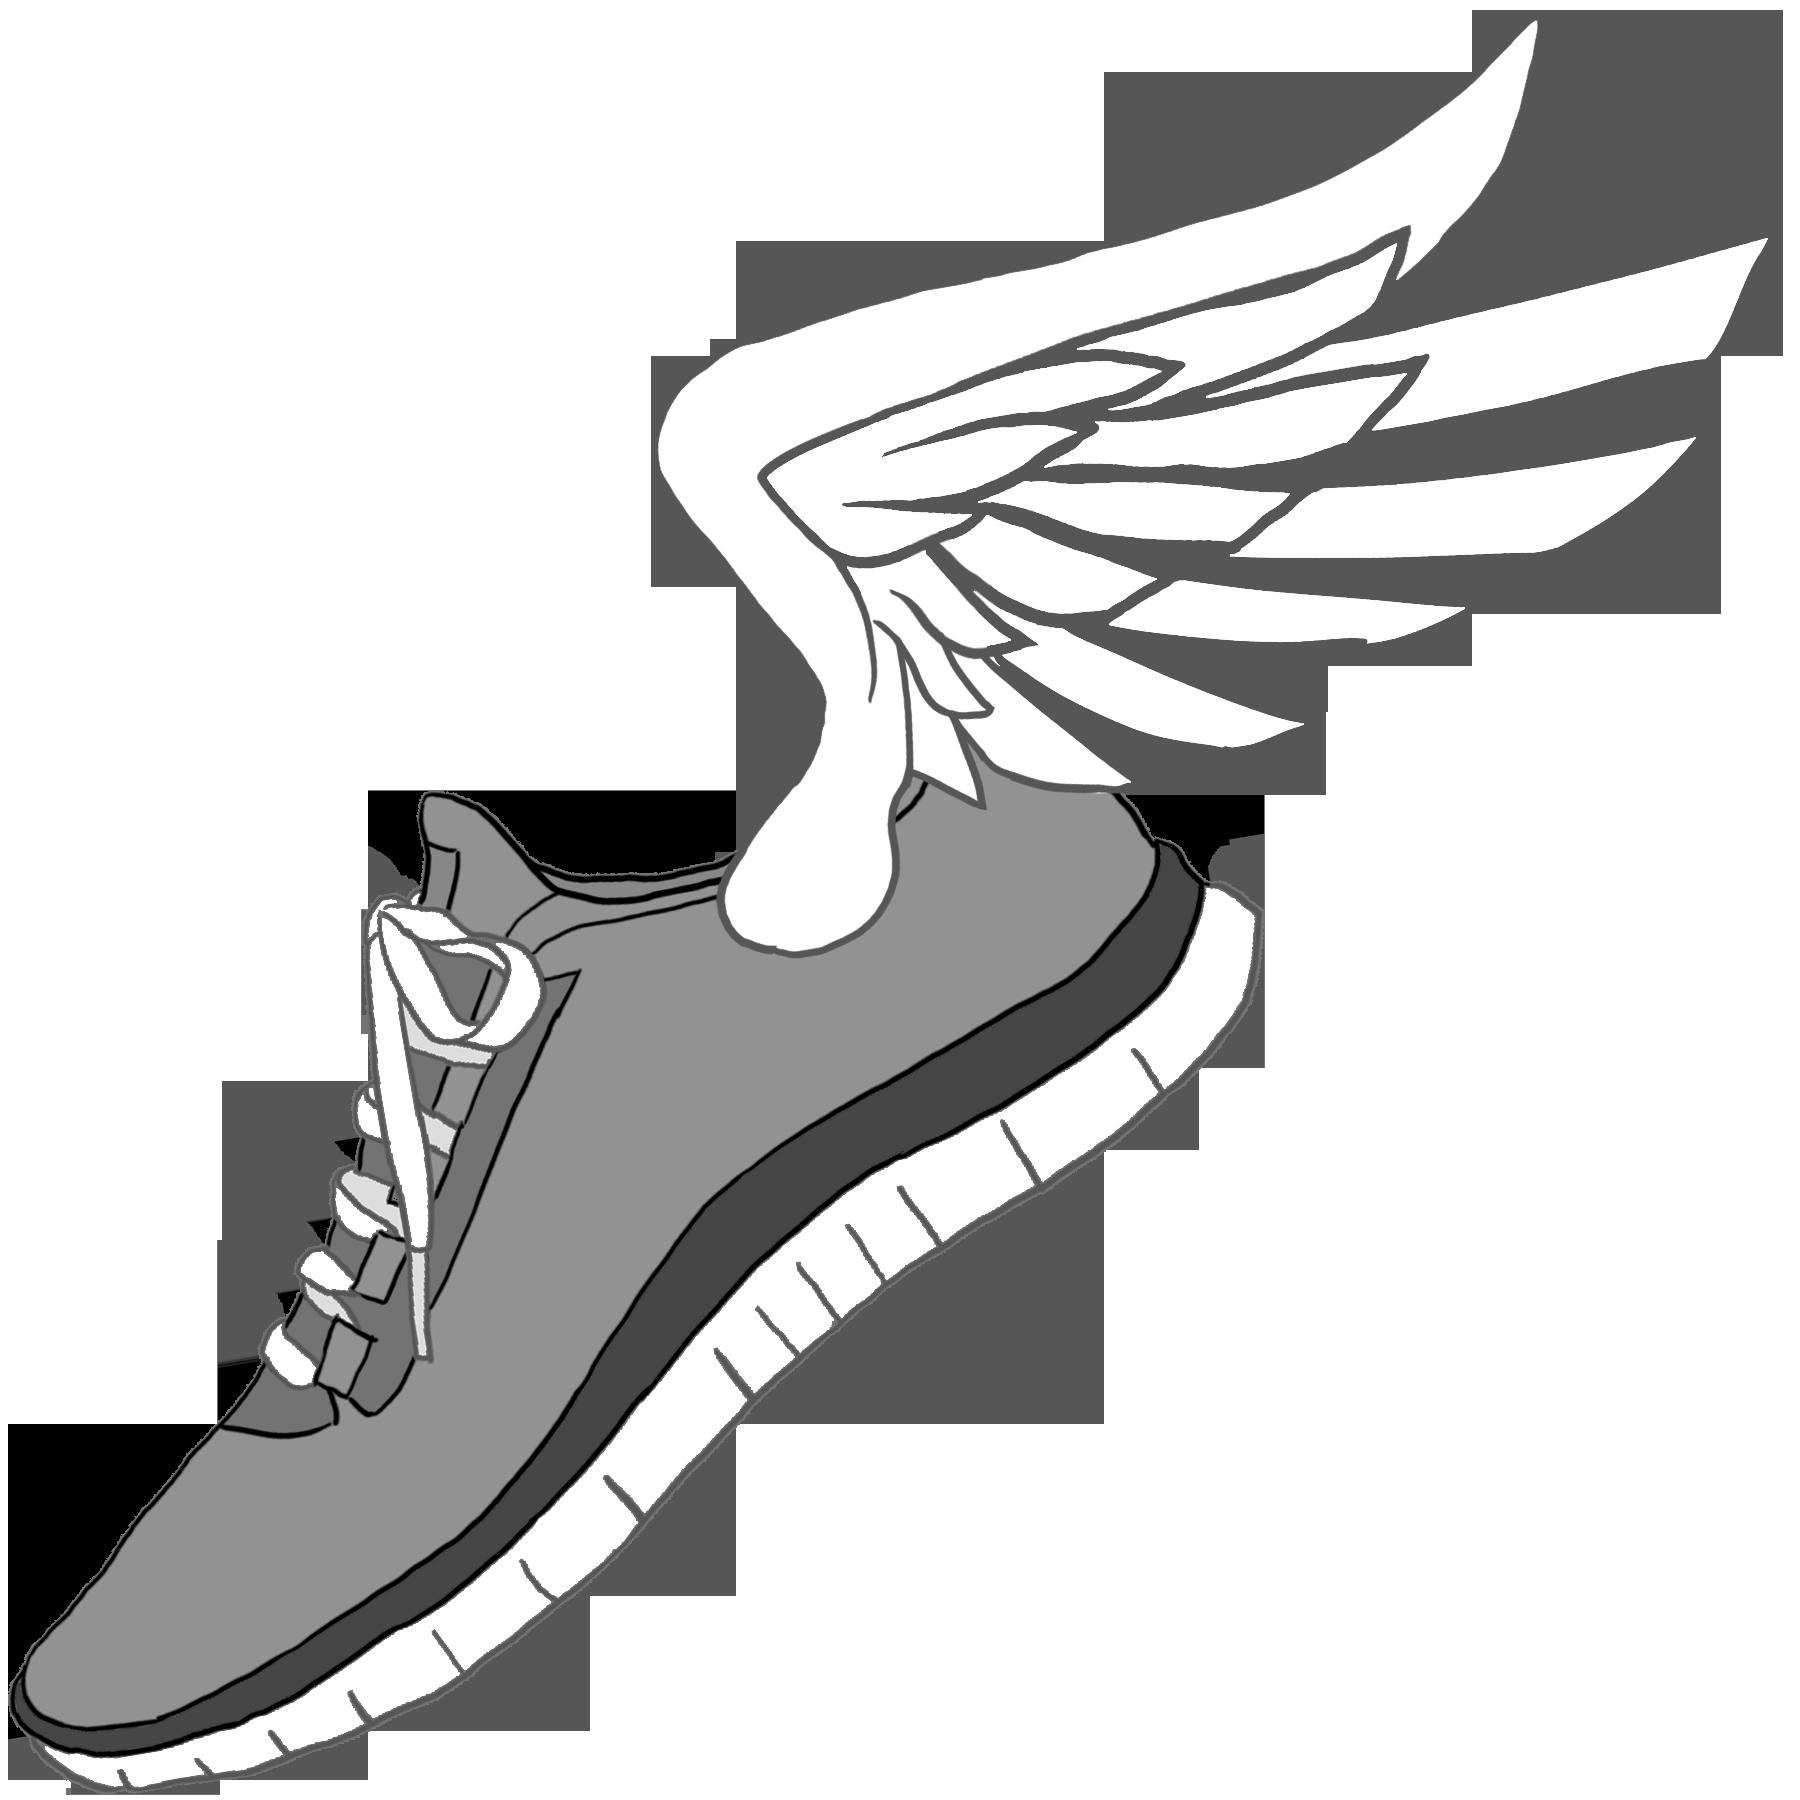 1800x1800 Track shoe running shoe telephone clip art image image